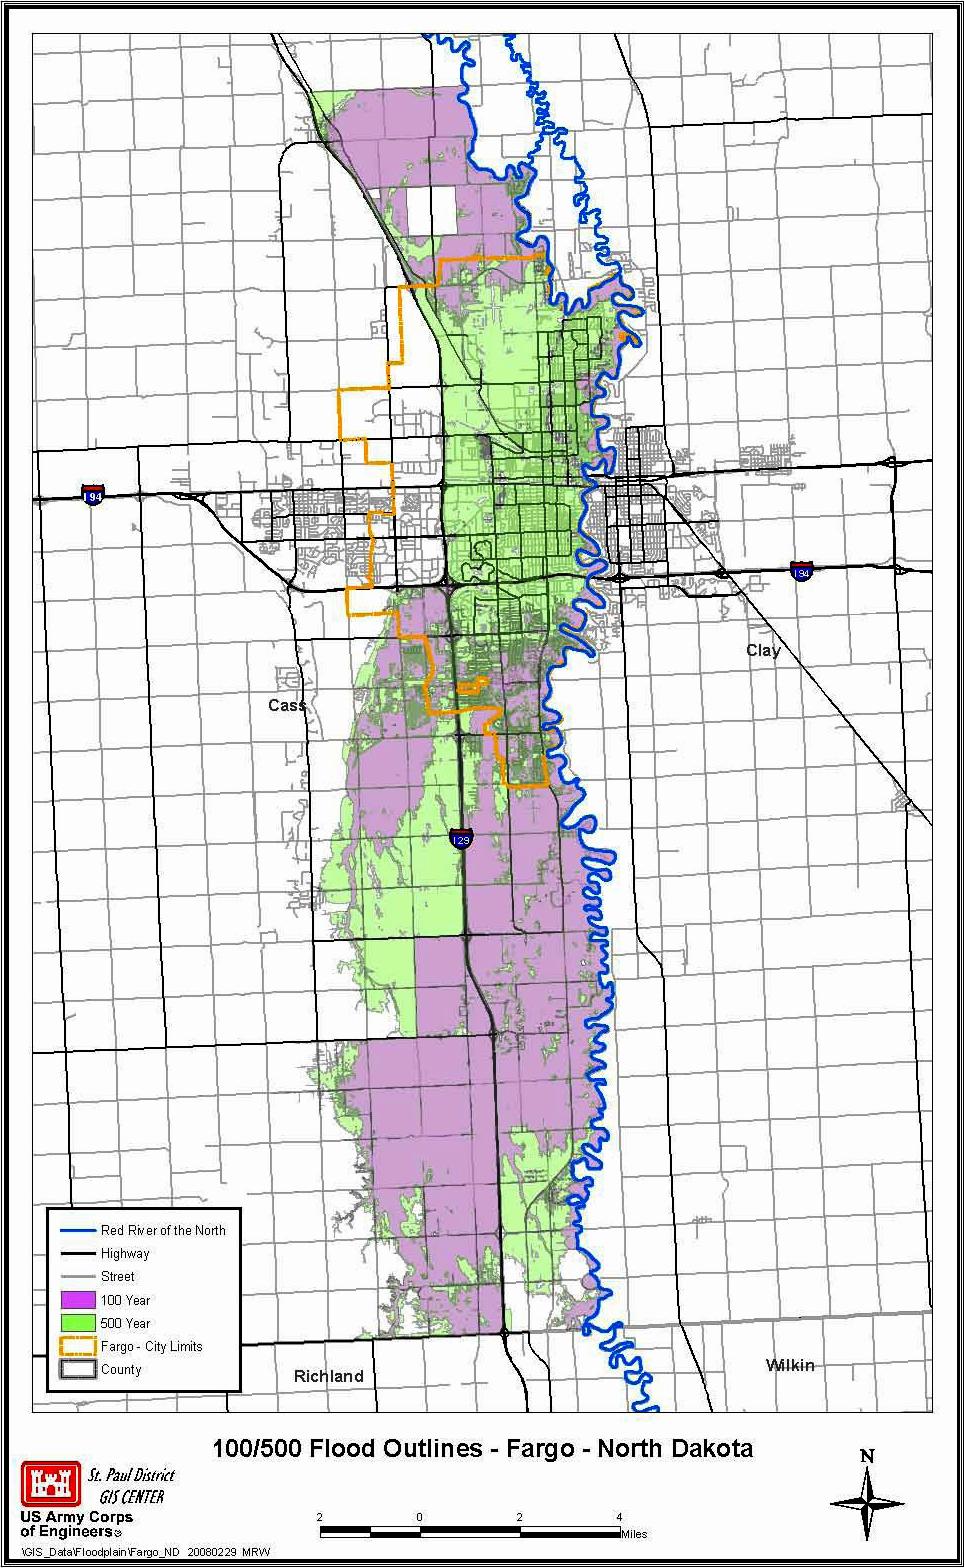 Original 100yr vs 500yr Flood Outline of Fargo, ND | FMDam.org on